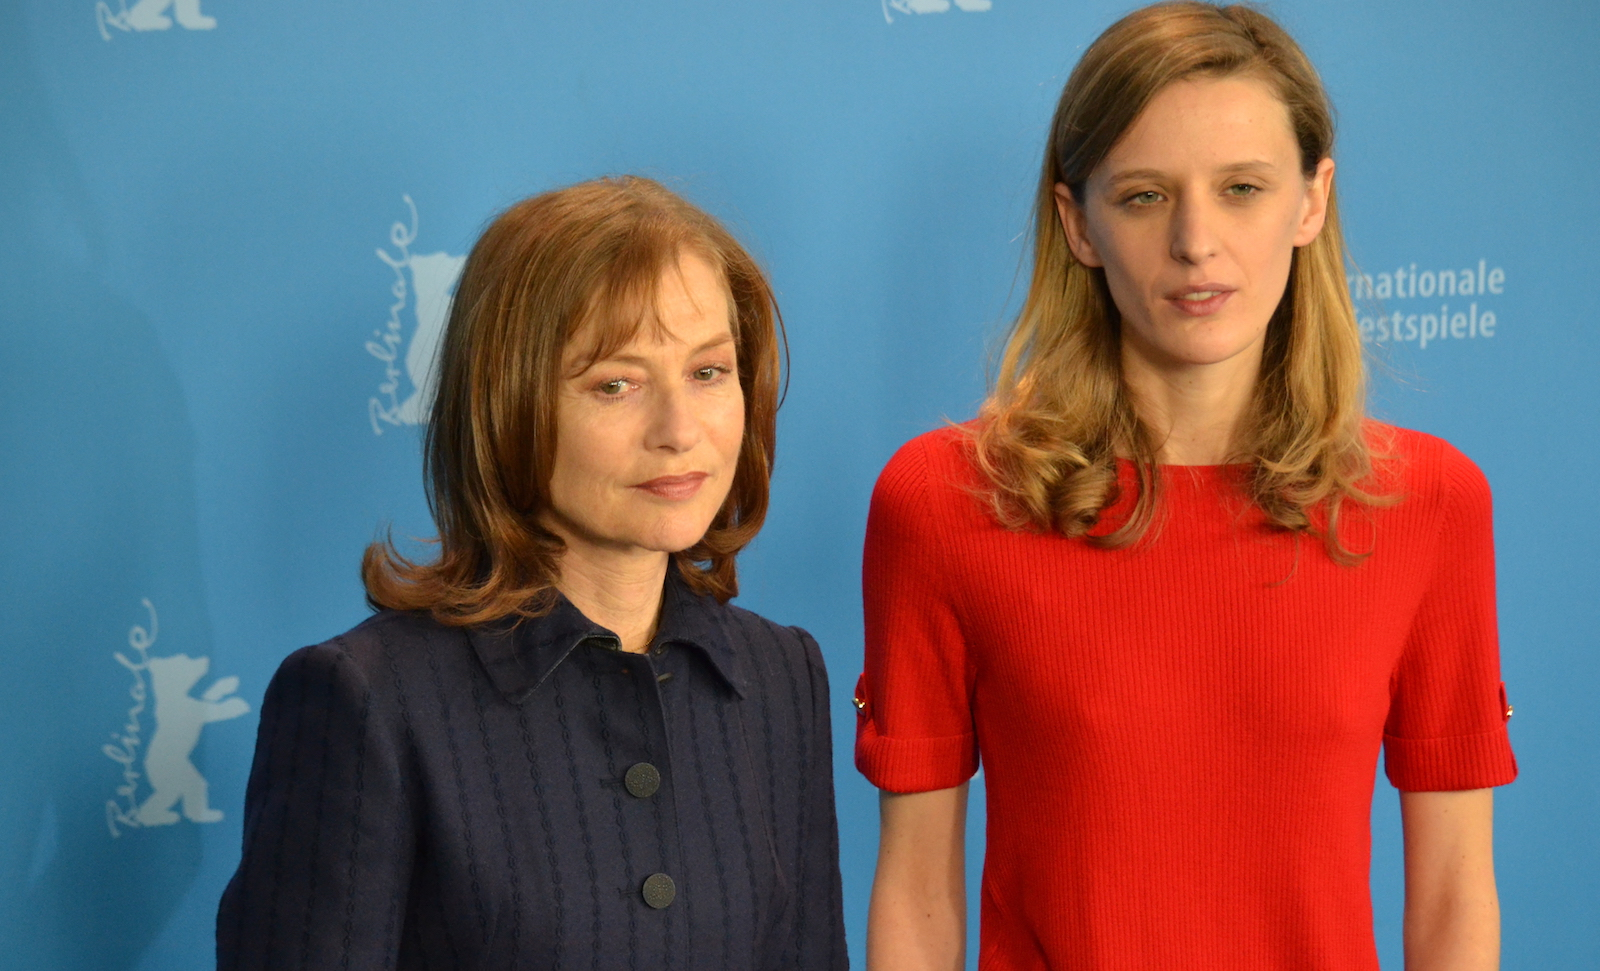 Berlino 2016: Mia Hansen-Løve e Isabelle Huppert al photocall di Things To Come